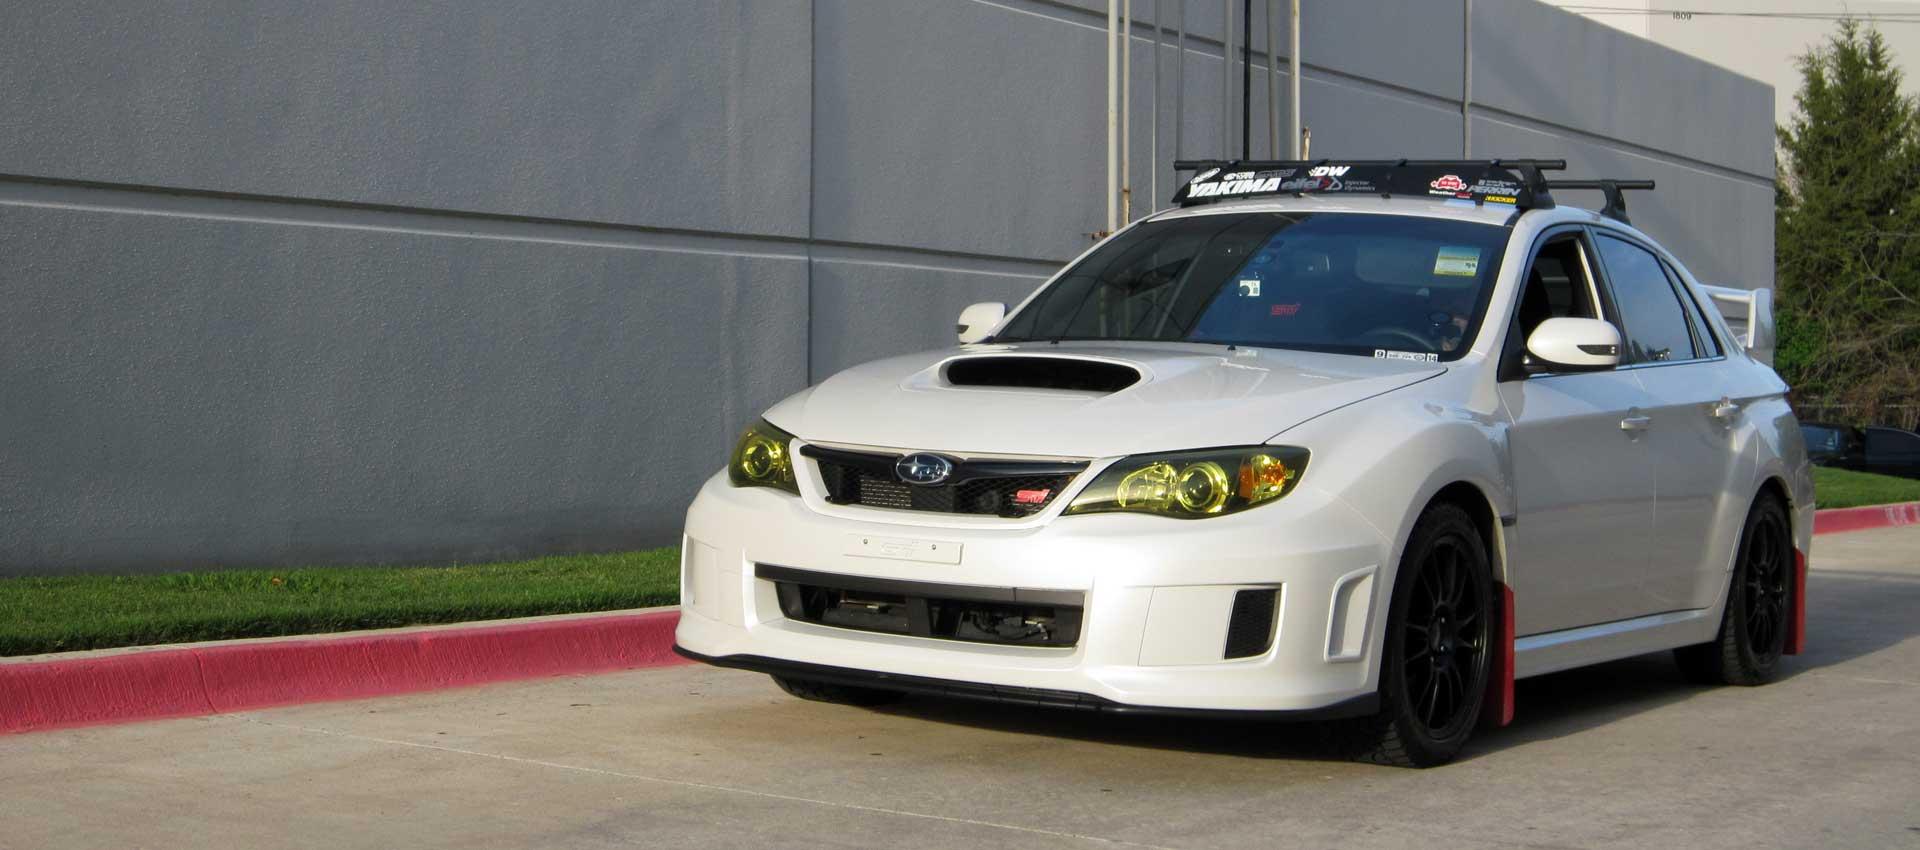 Headlight Armor , GT Racing Yellow Headlight and Fog Light Kits